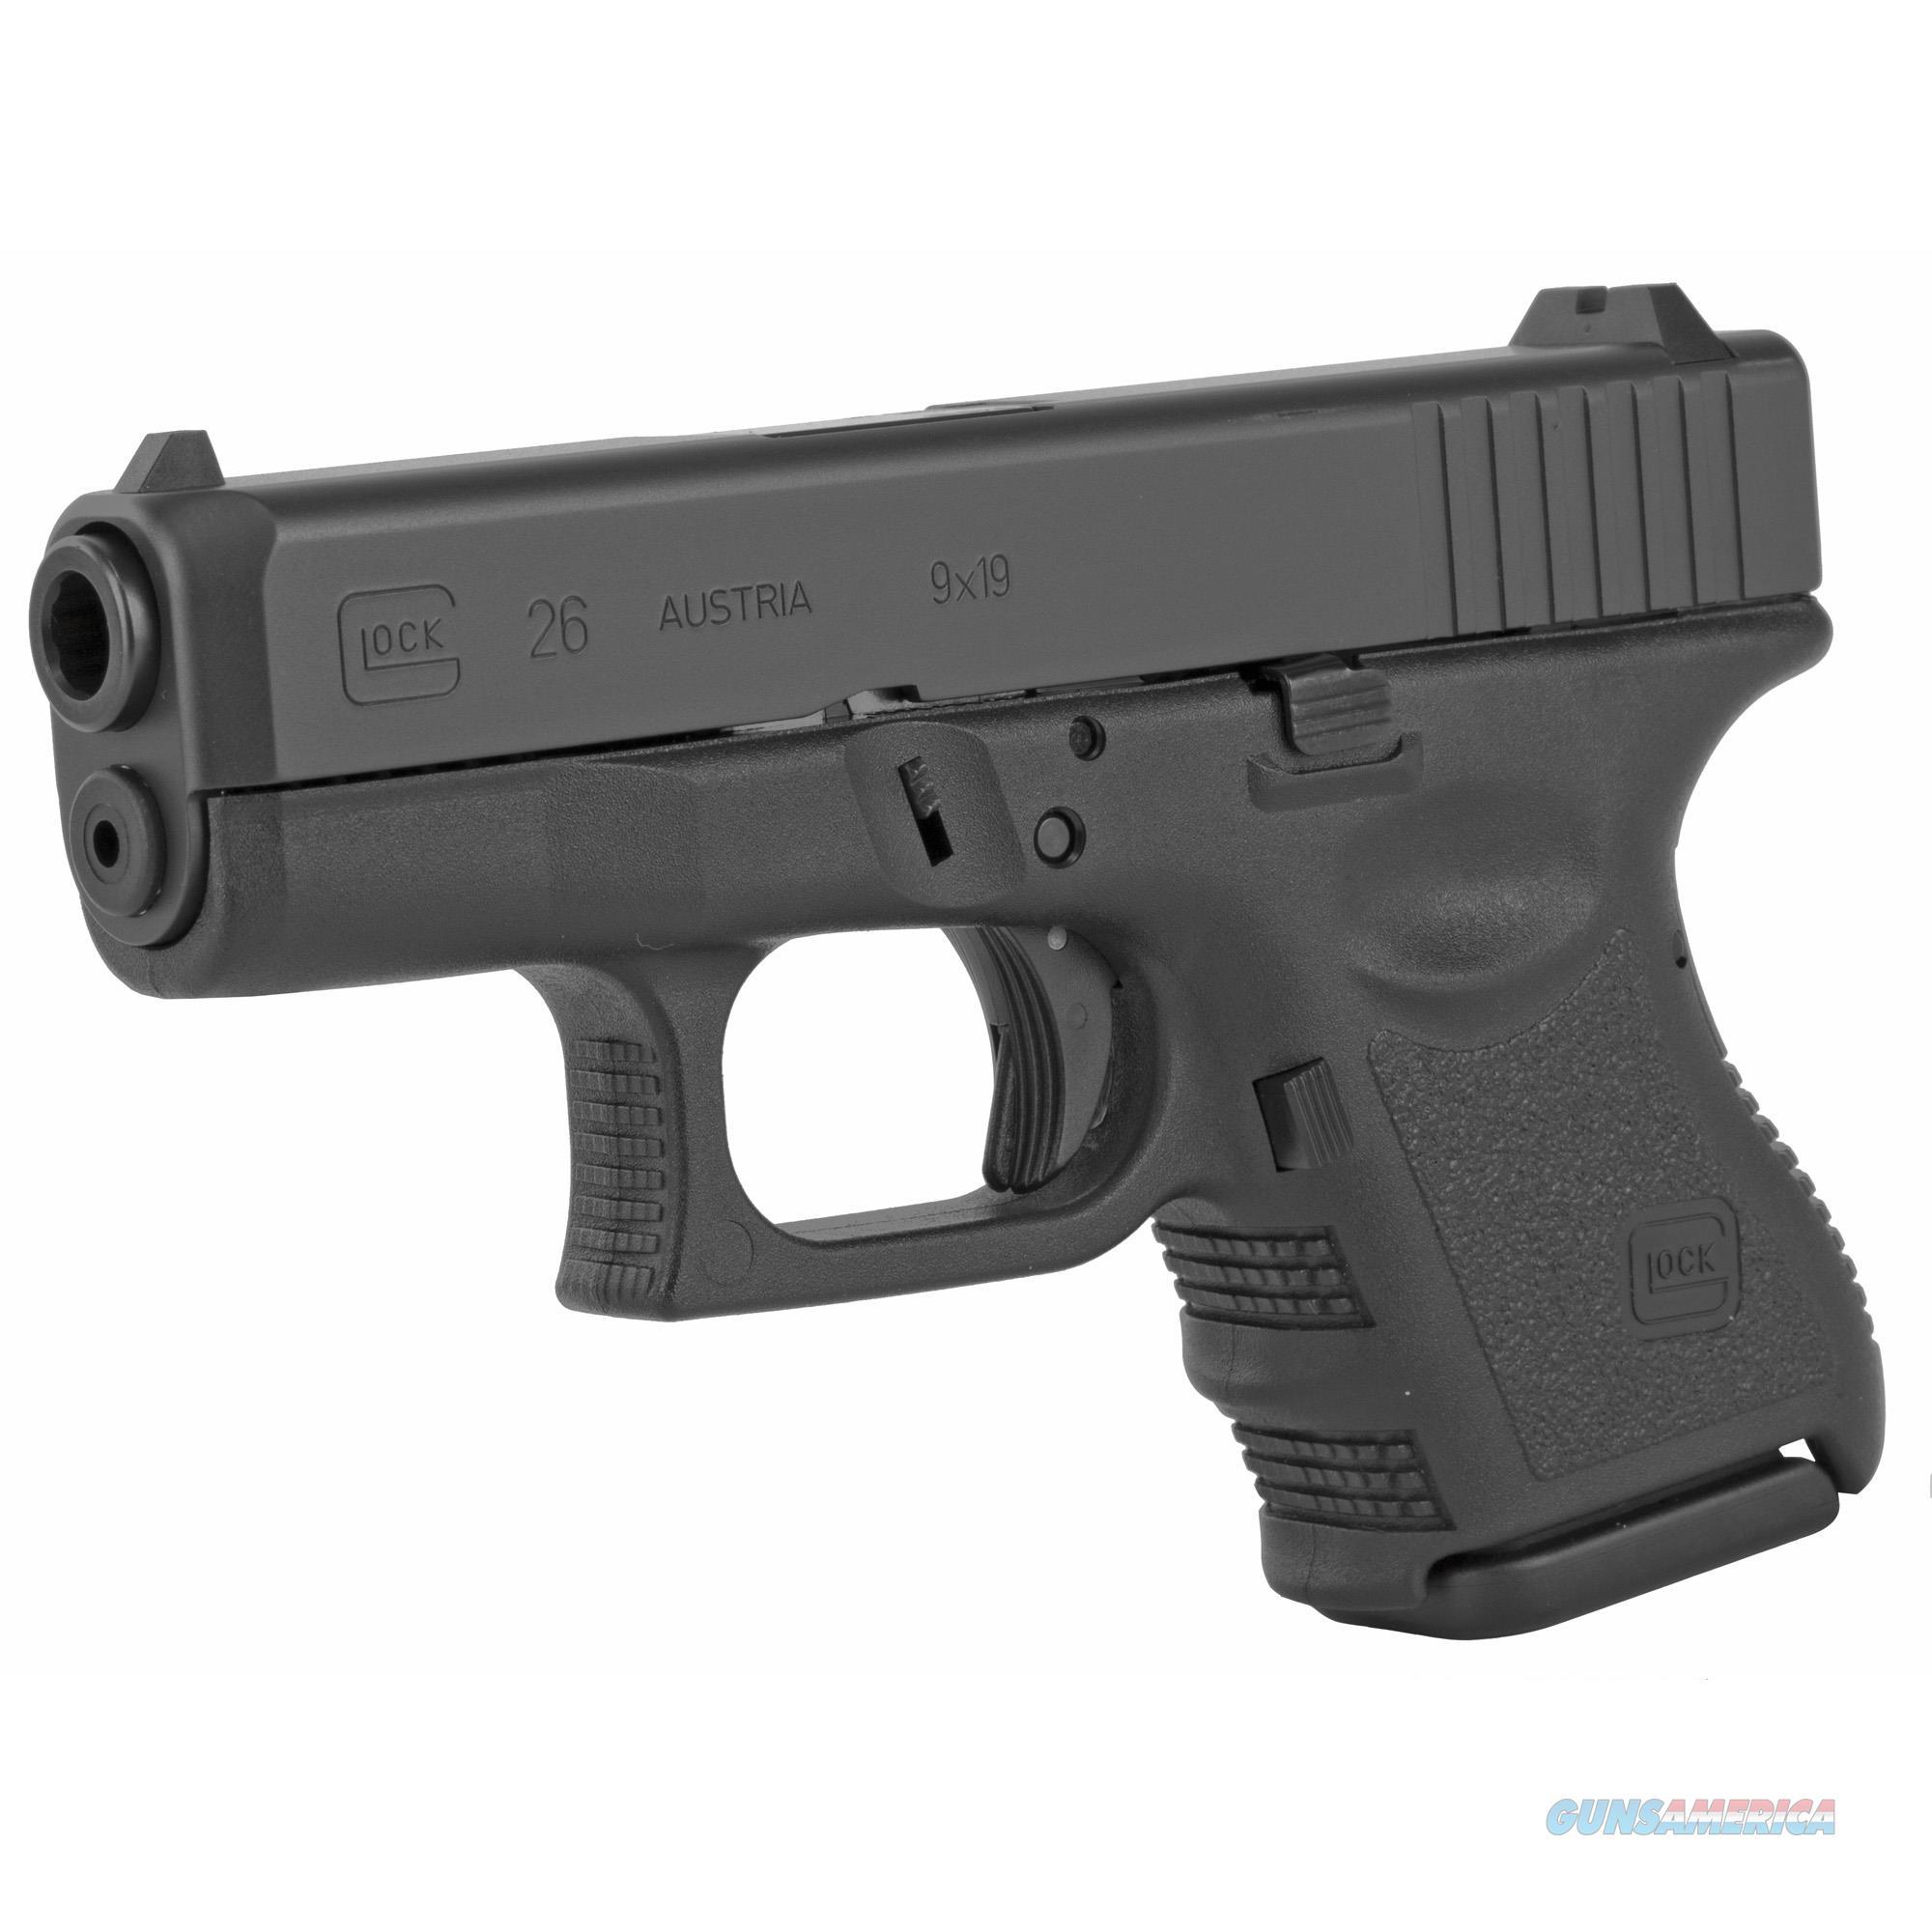 "Glock G26 *CA Compliant* 9mm 3.42"" 10+1 + New in Case!    Guns > Pistols > Glock Pistols > 26/27"